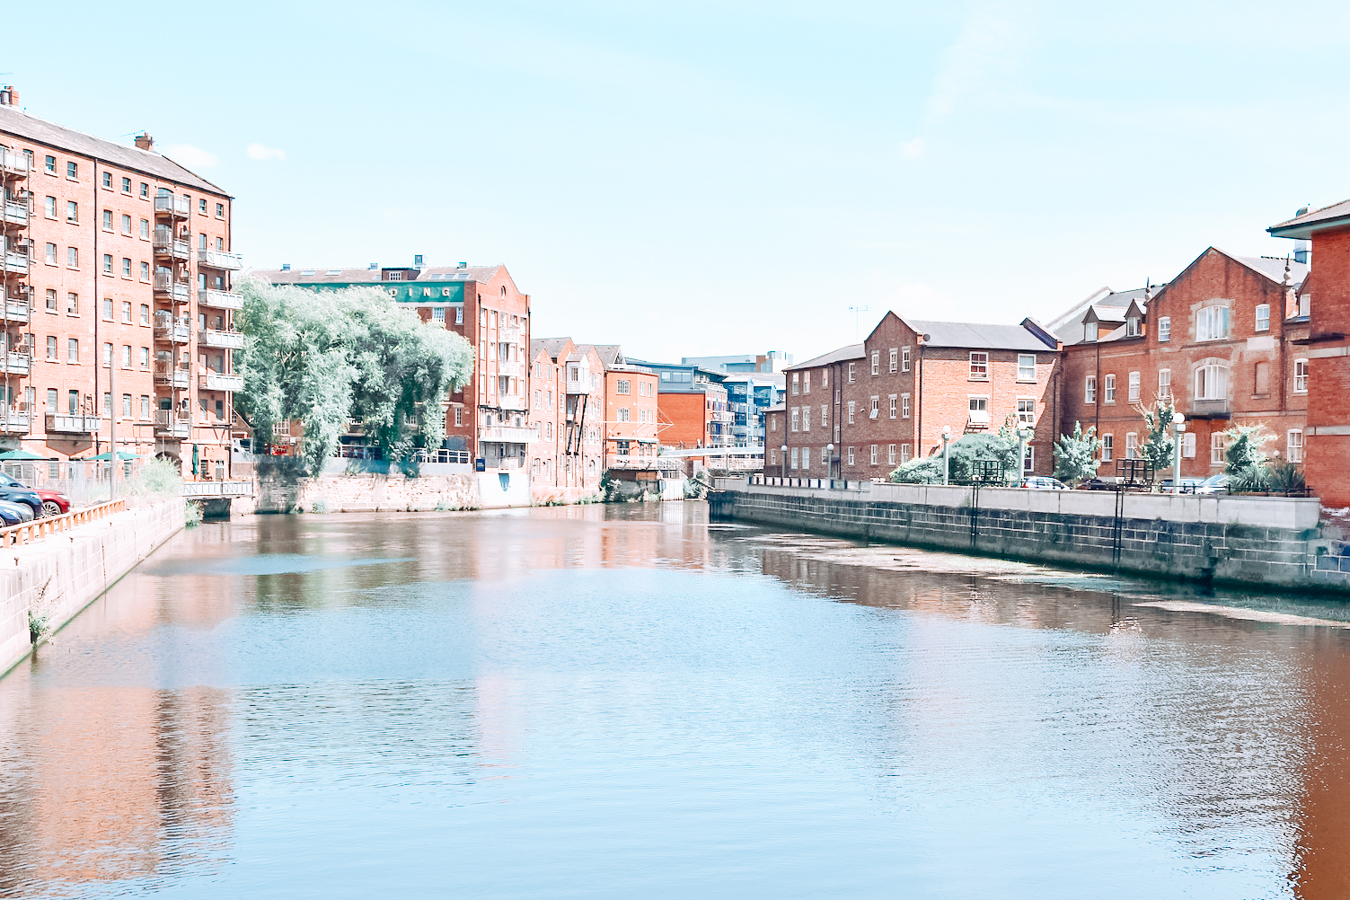 Water and buildings in Leeds